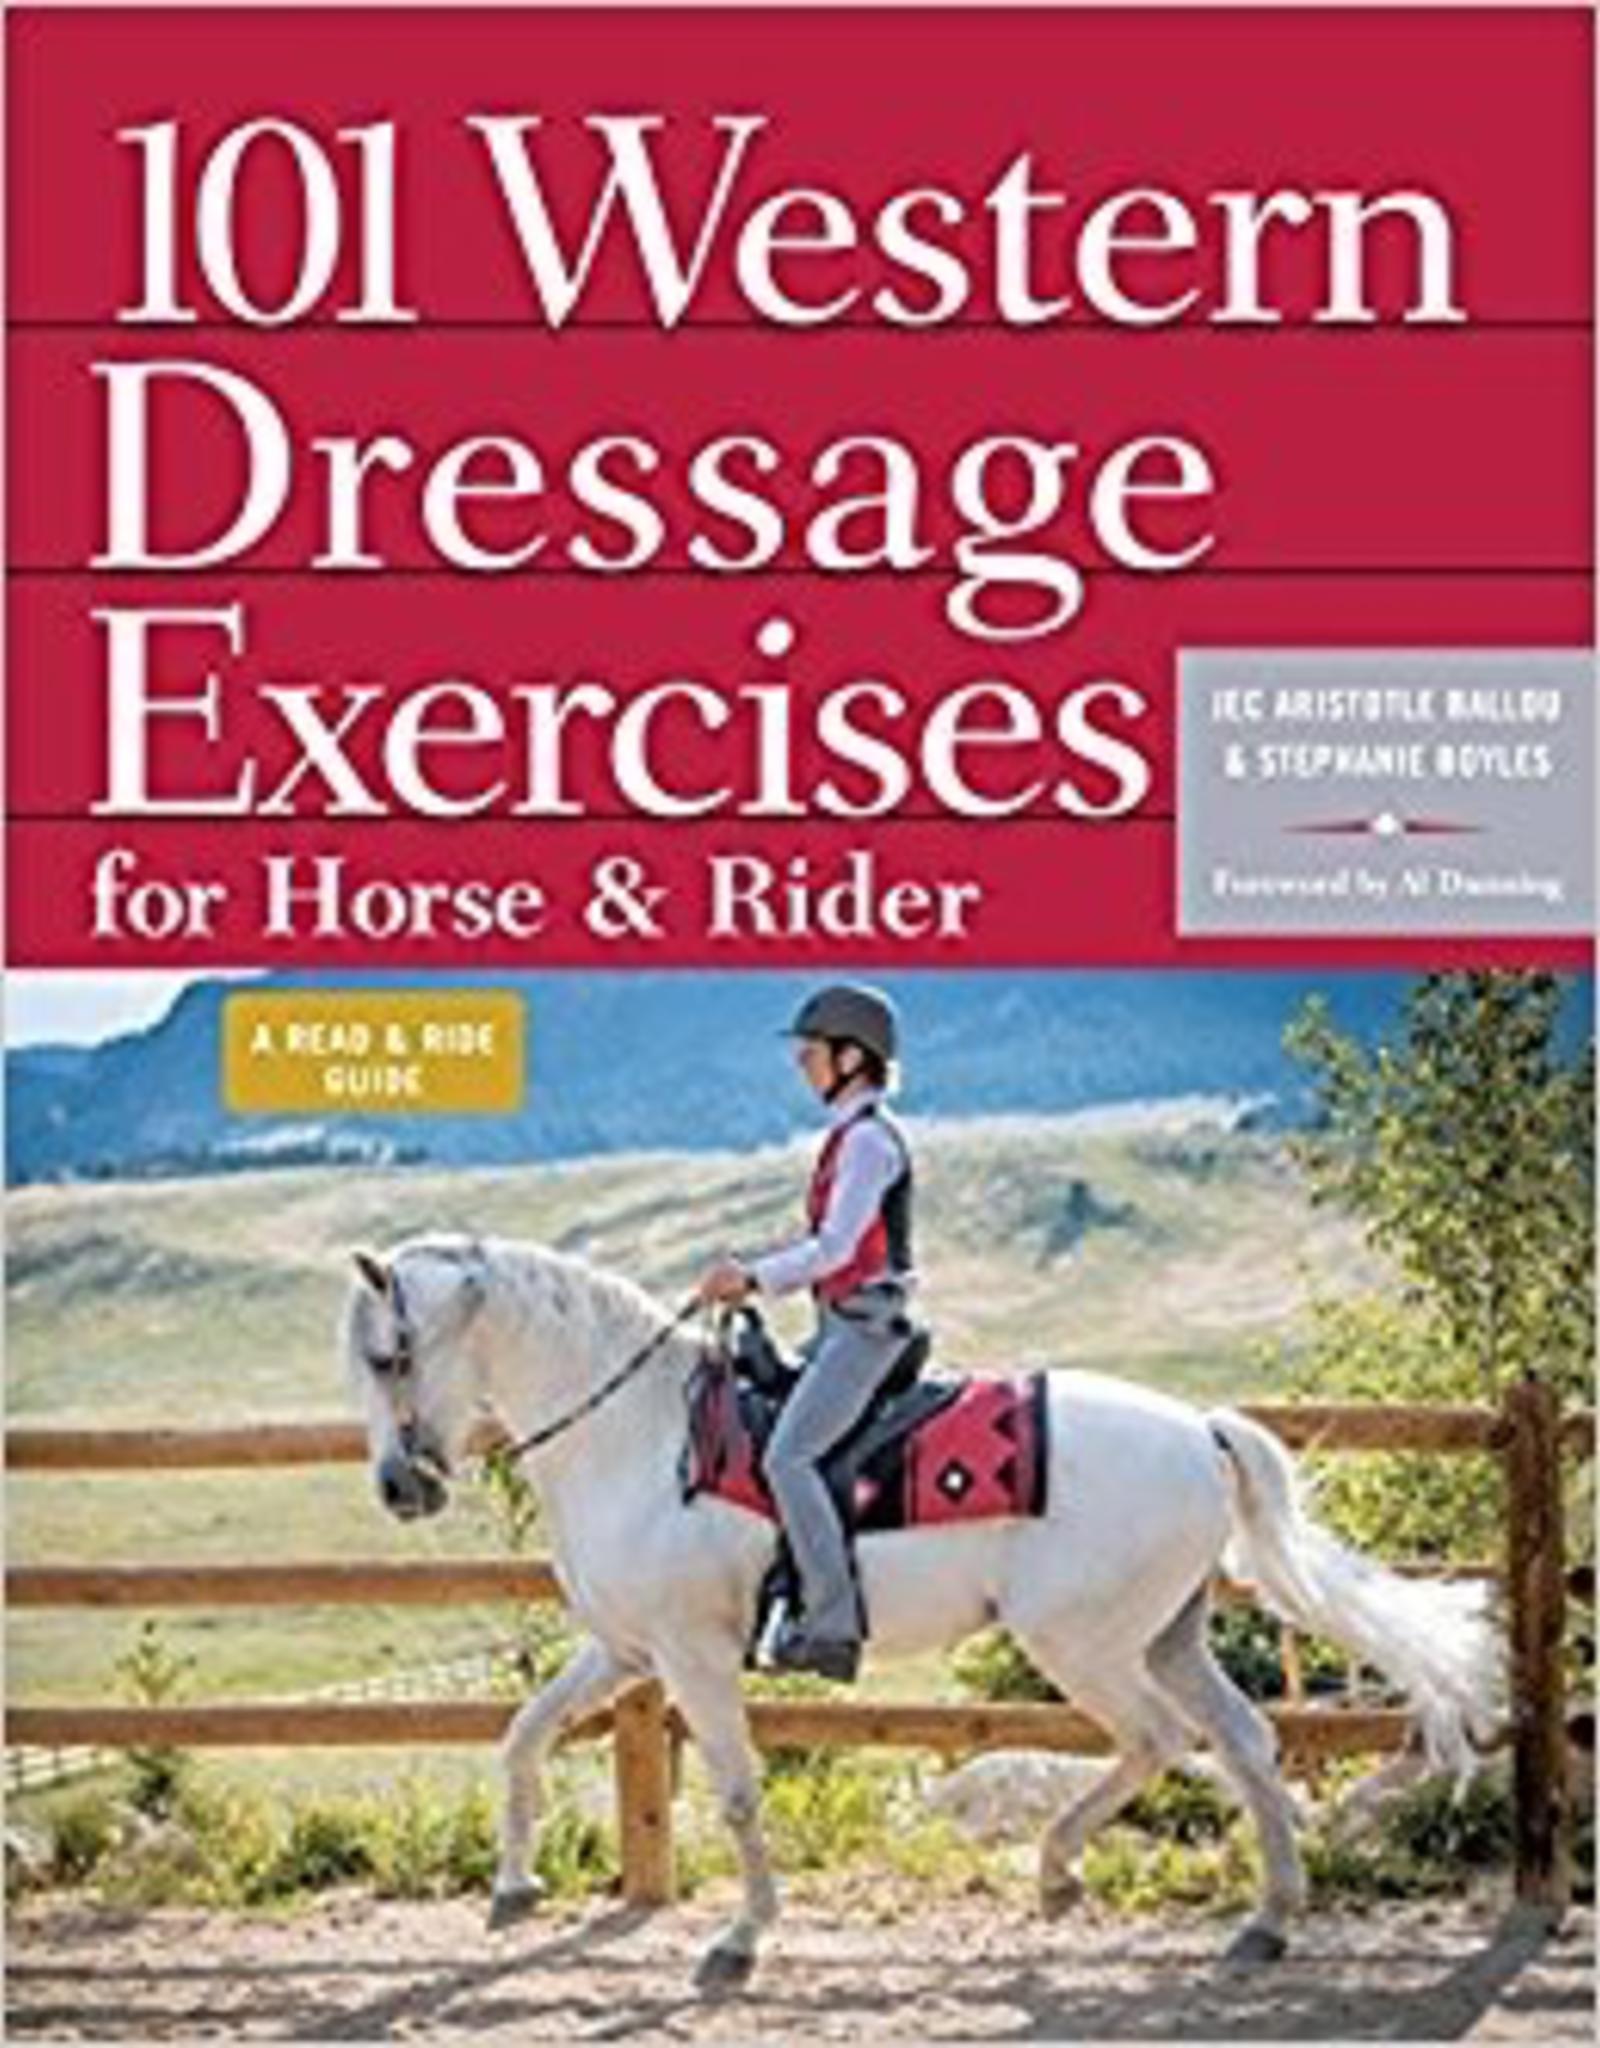 101 Western Dressage Exercises